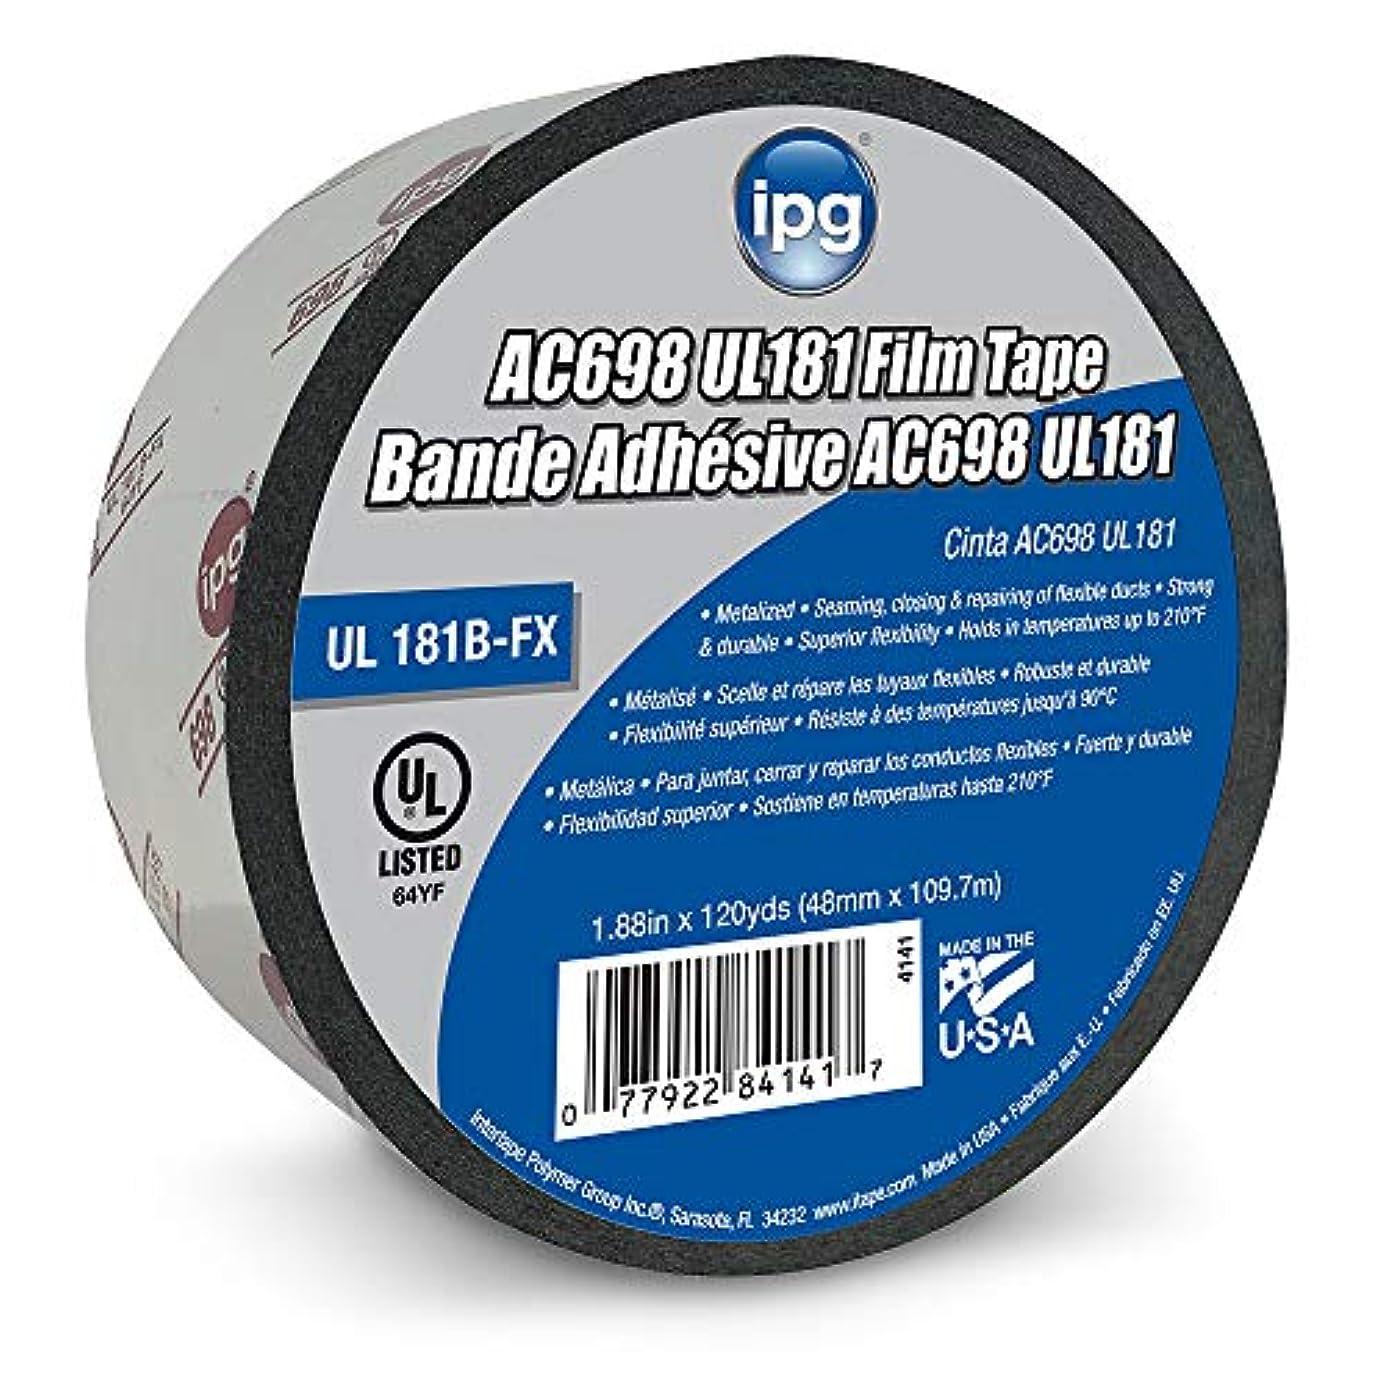 IPG AC698 UL181 Printed Film Metalized HVAC Tape, 1.88